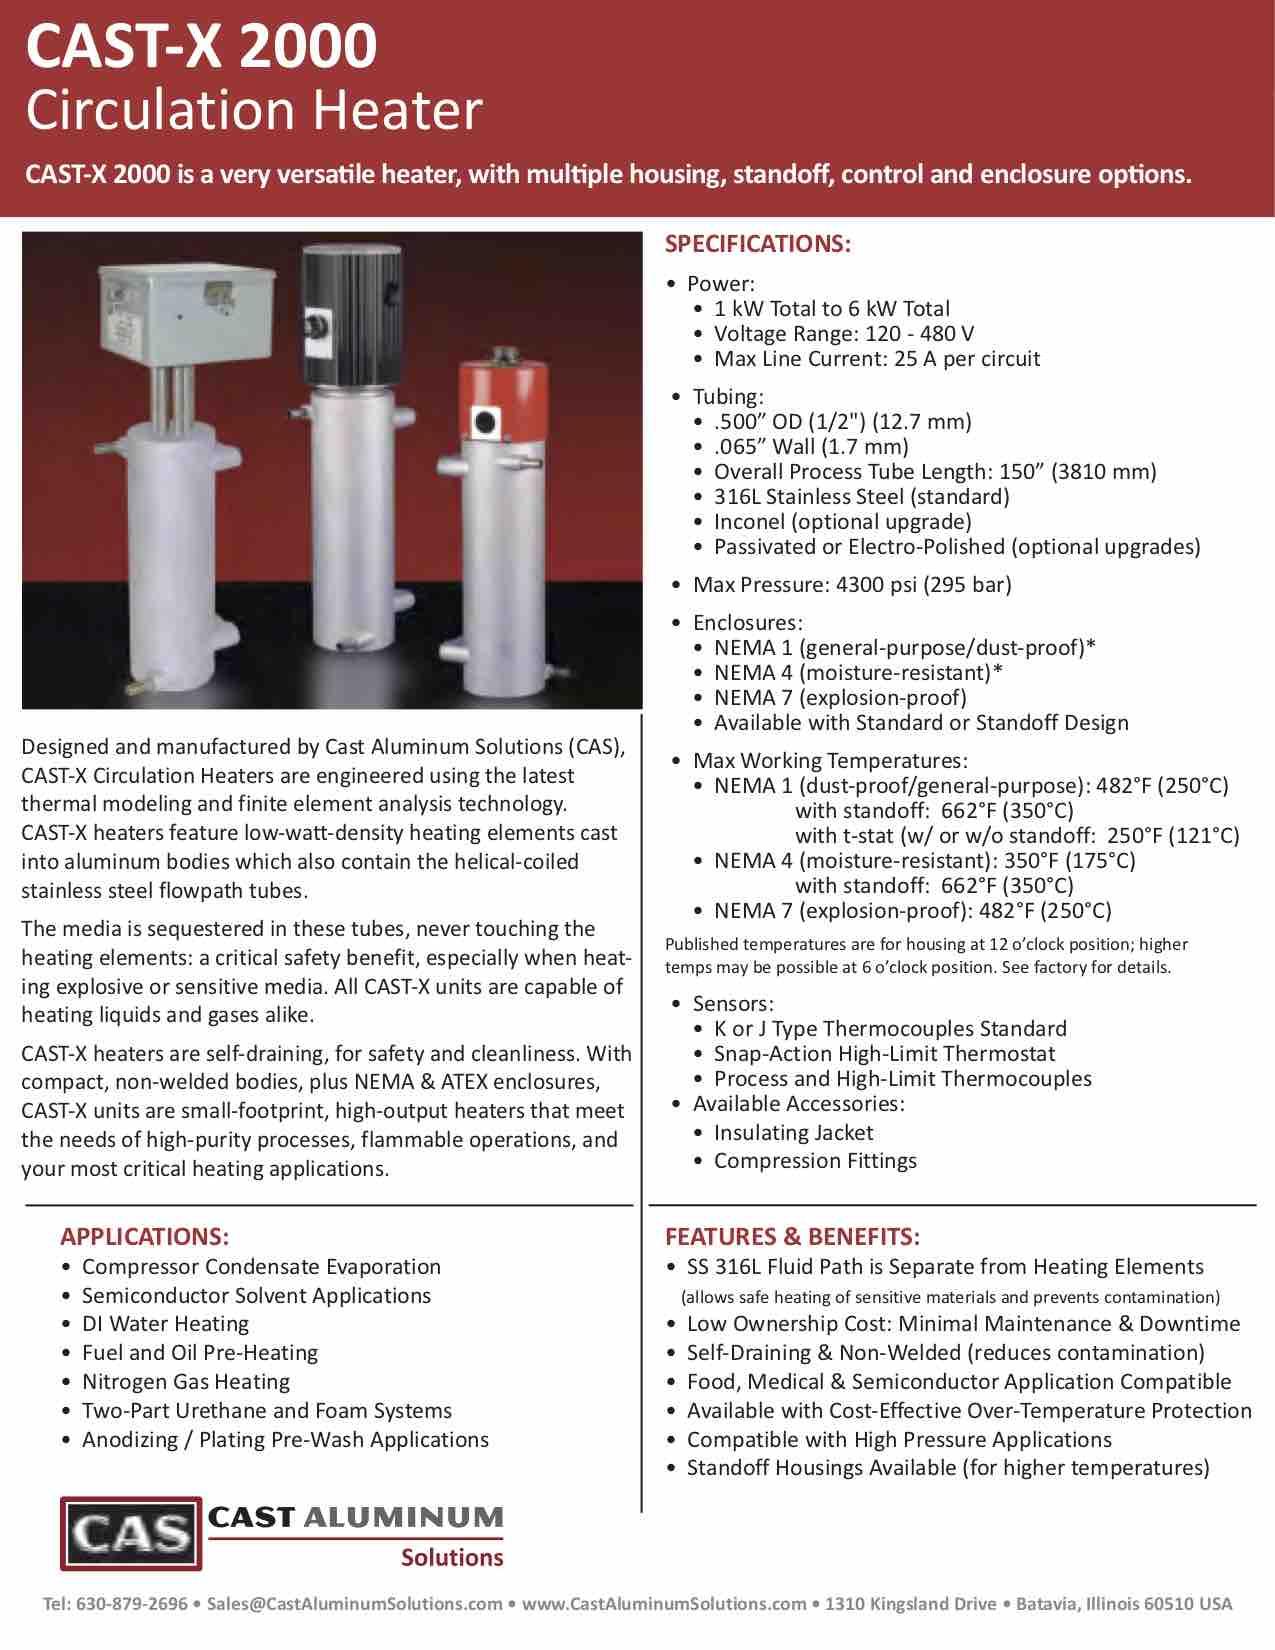 CAST X 2000 Circulation Heater Cast Aluminum Solutions (dragged)